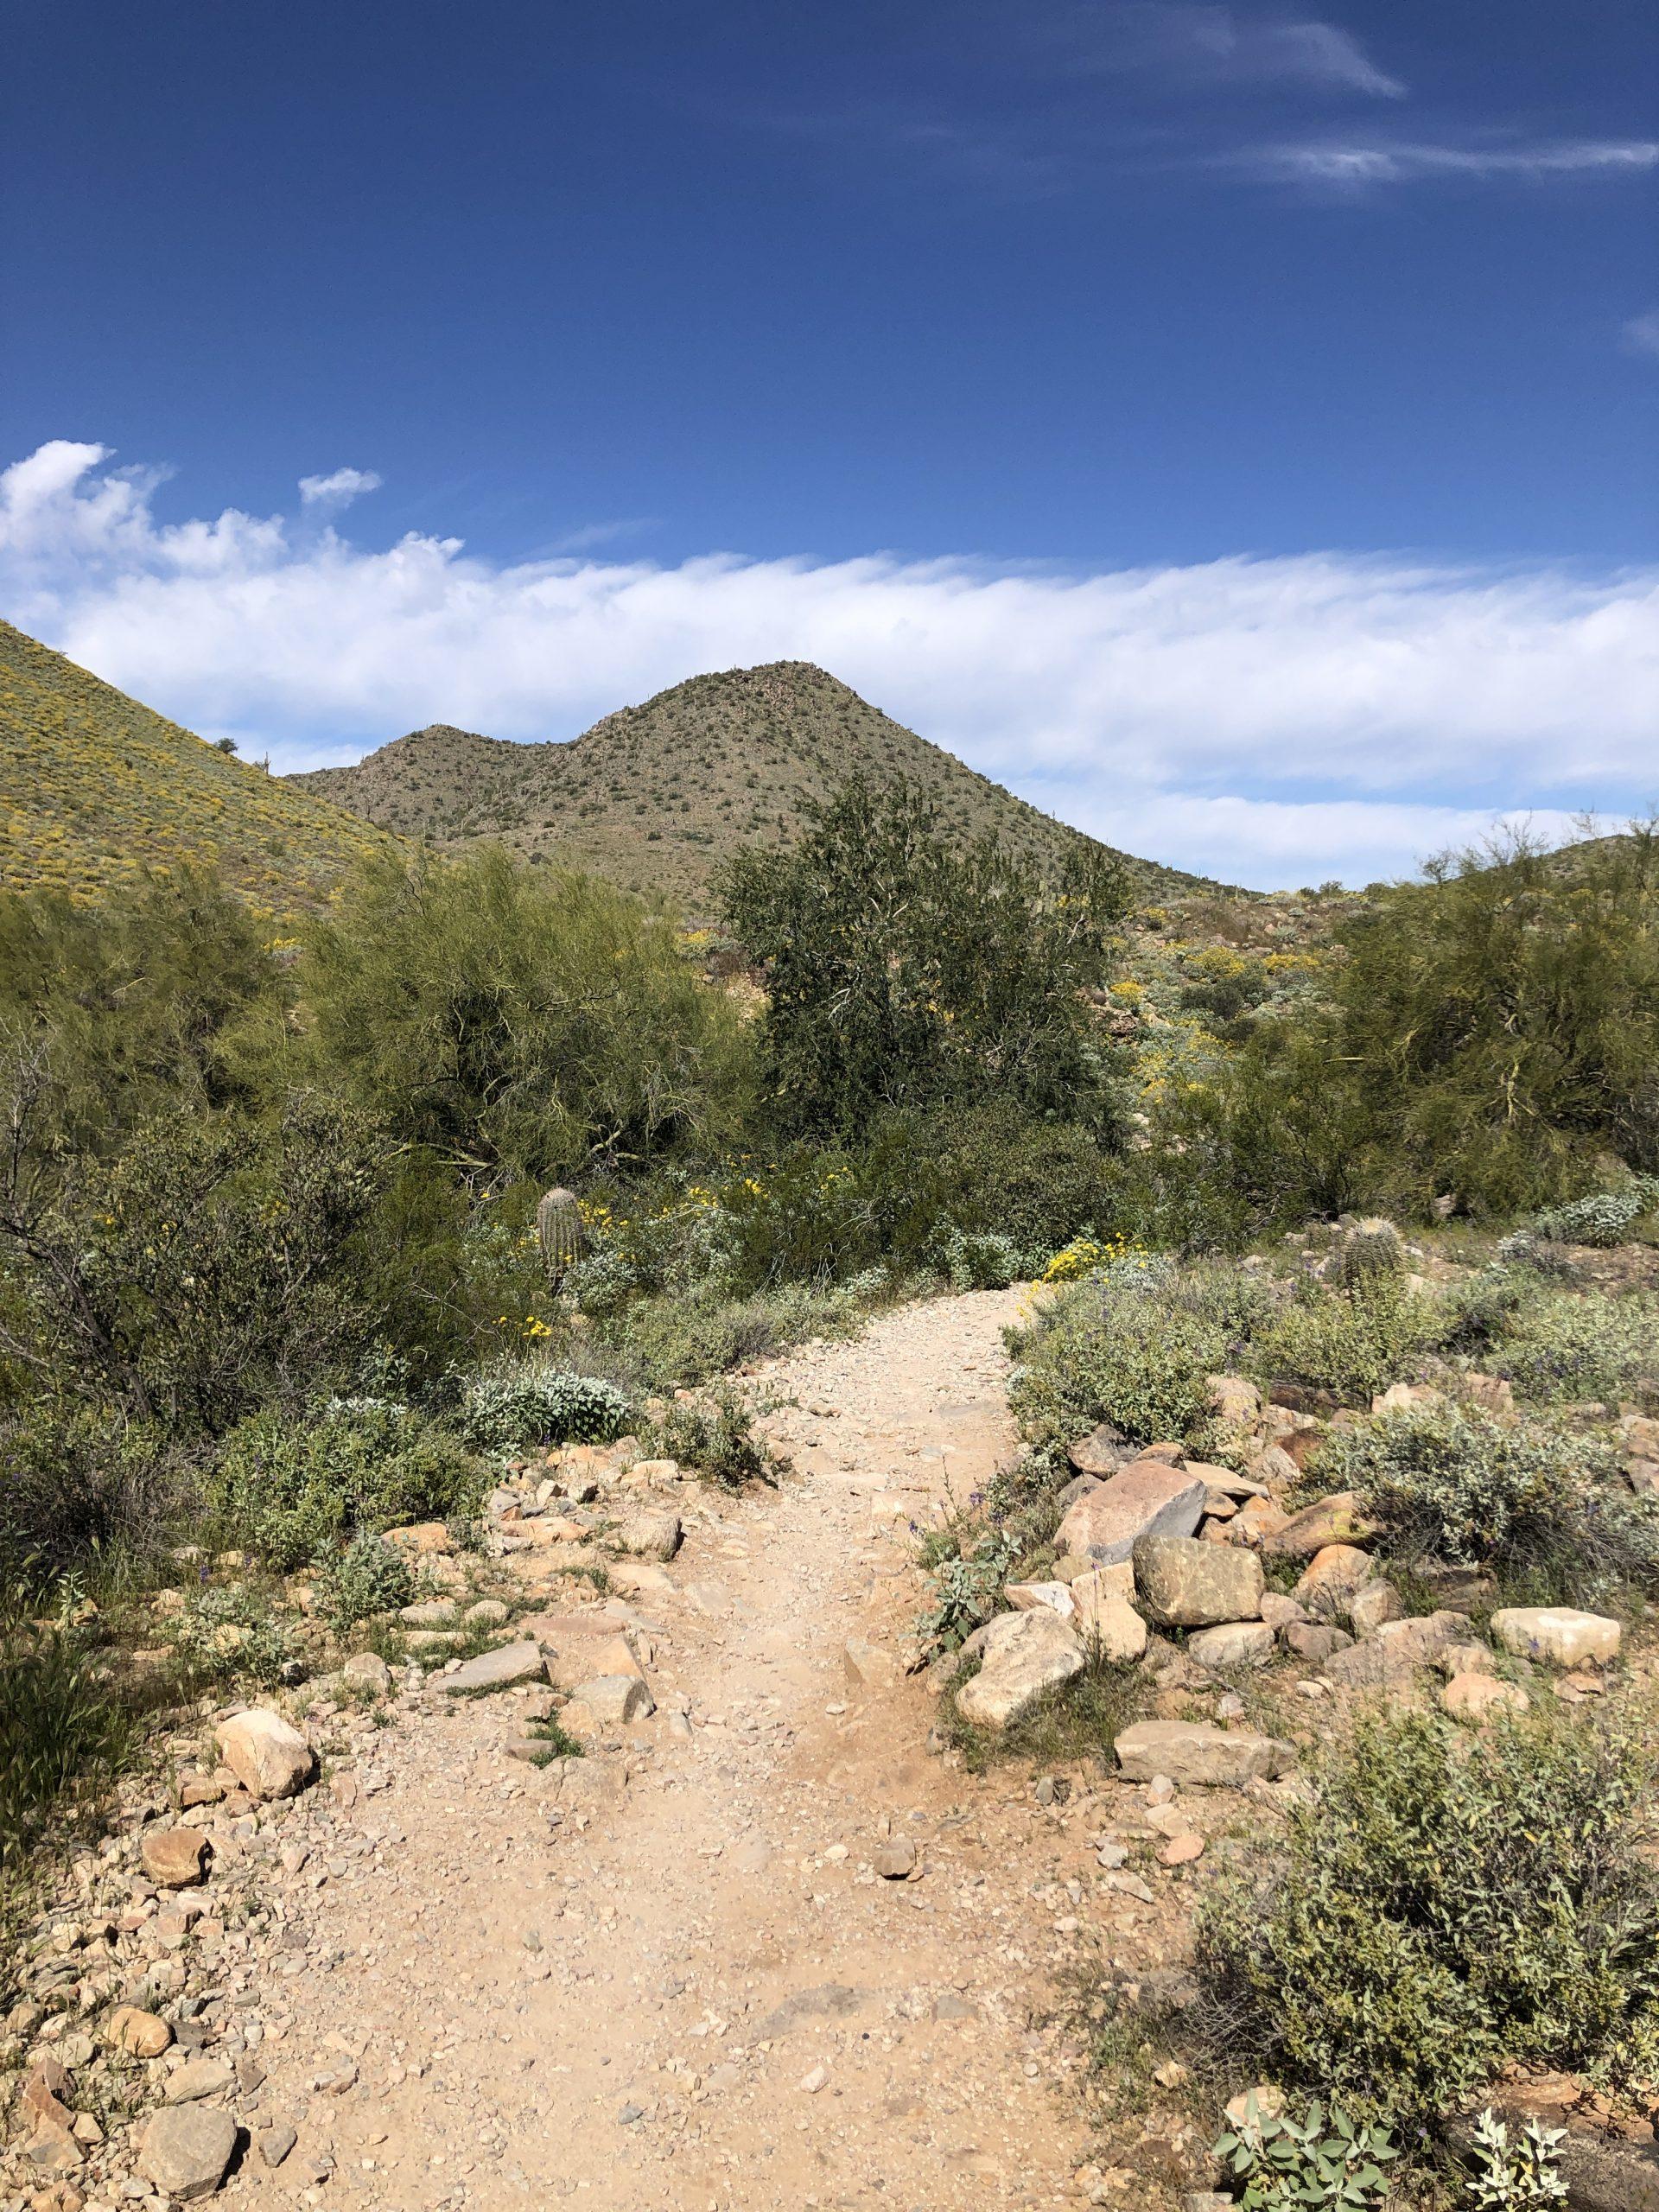 Lost Dog Trail, March 2020